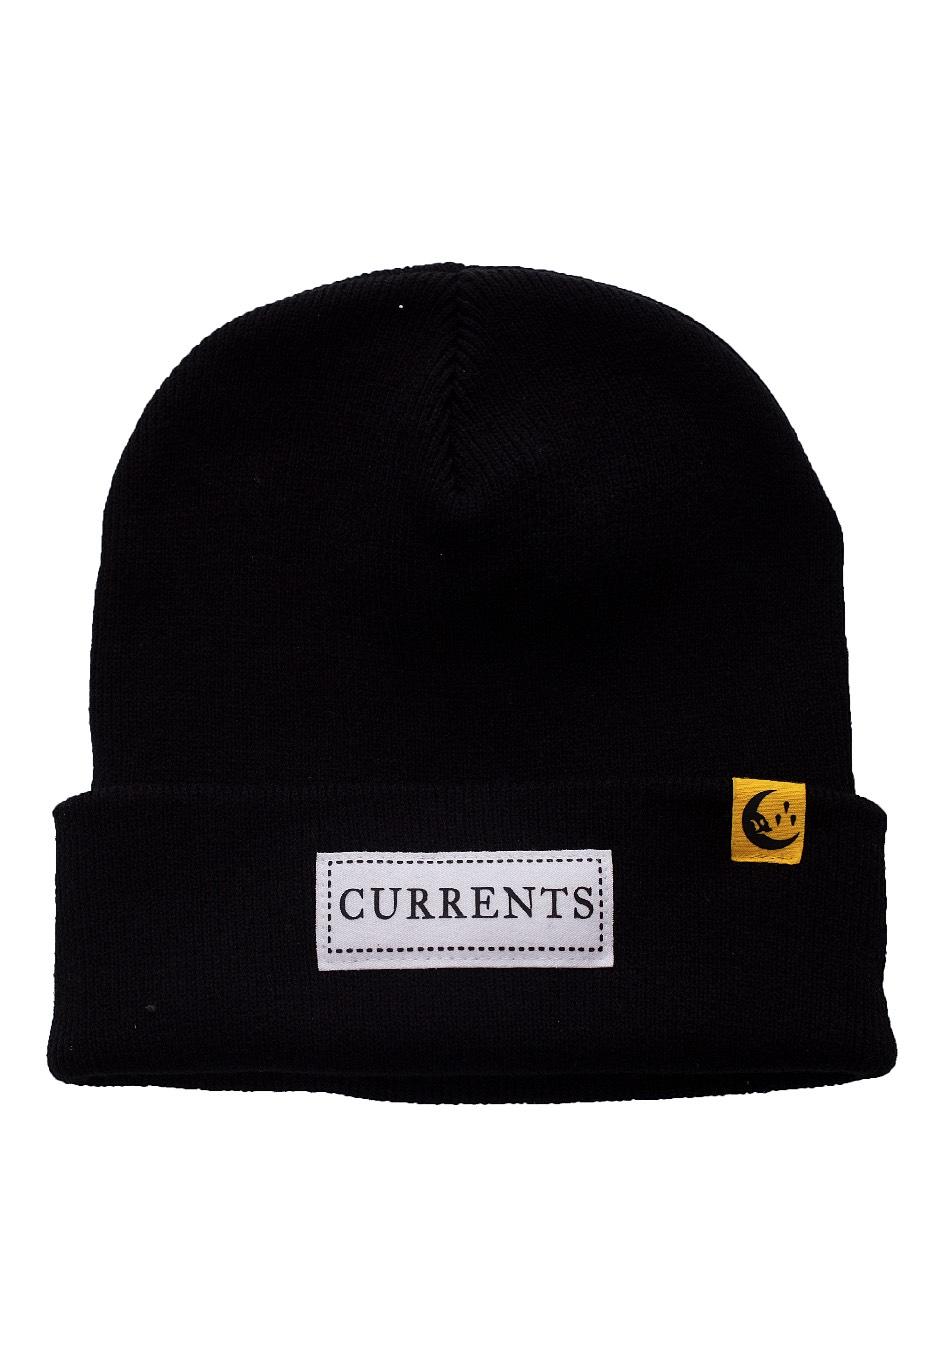 Currents - Box Logo - Beanies